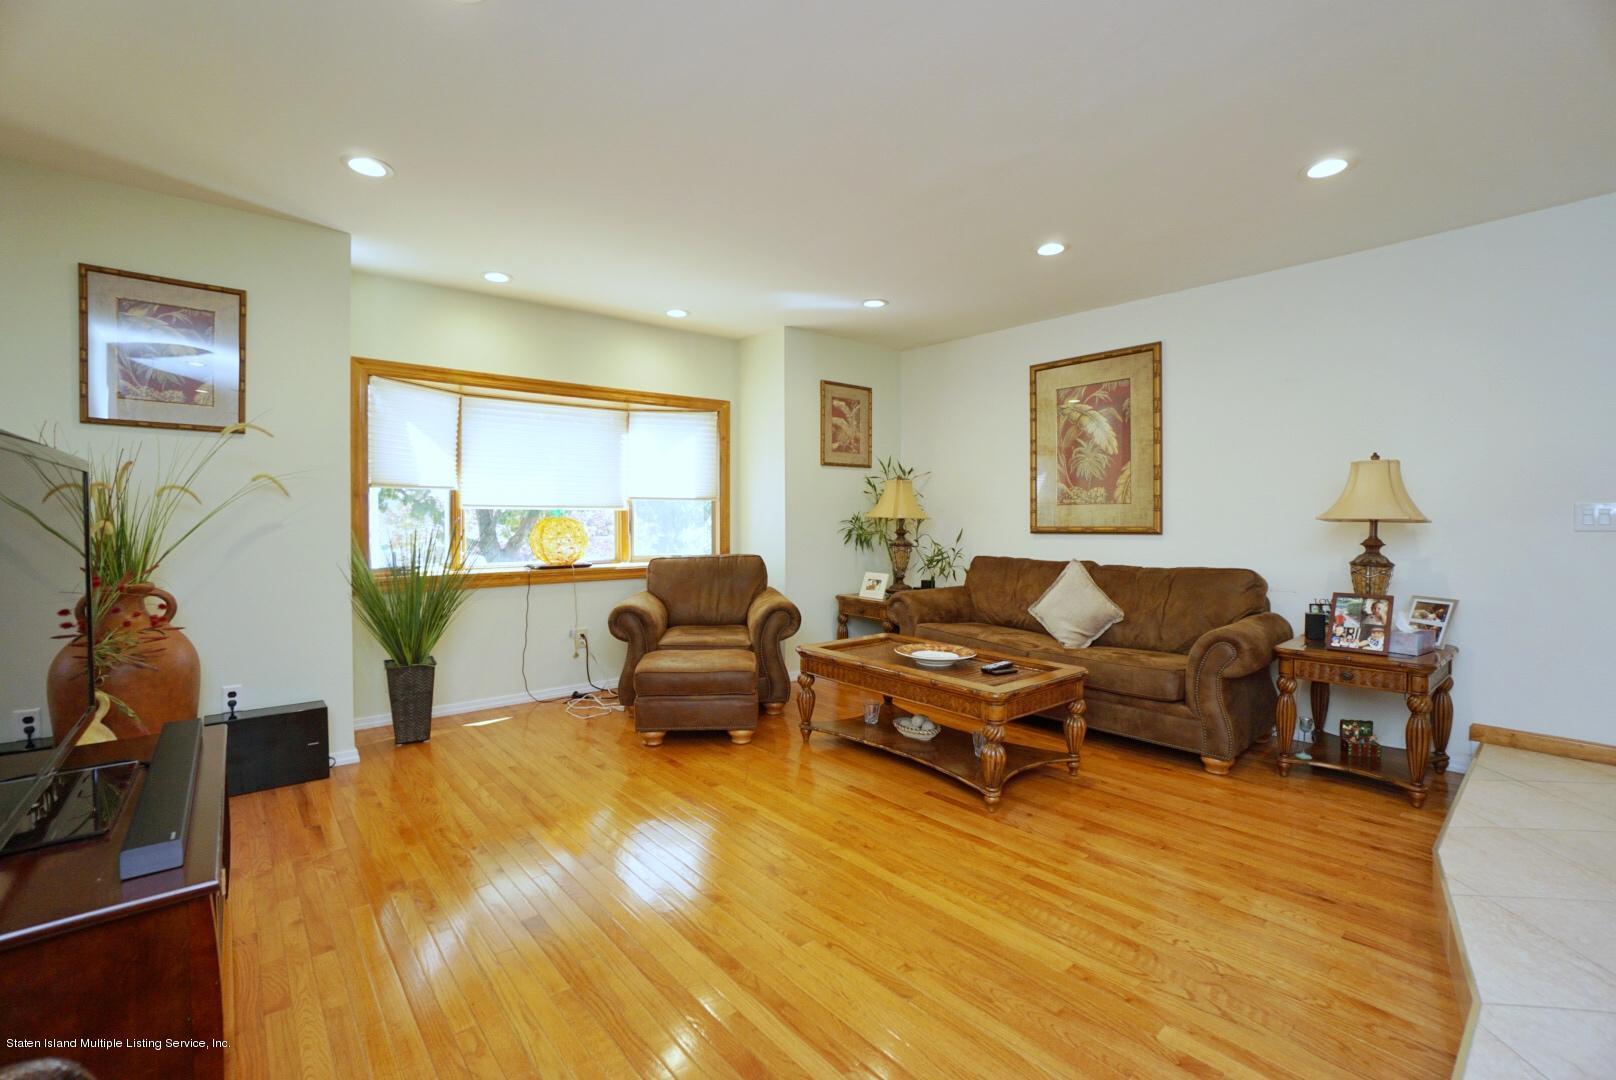 Single Family - Semi-Attached 47 Ilyse Court   Staten Island, NY 10306, MLS-1141335-6